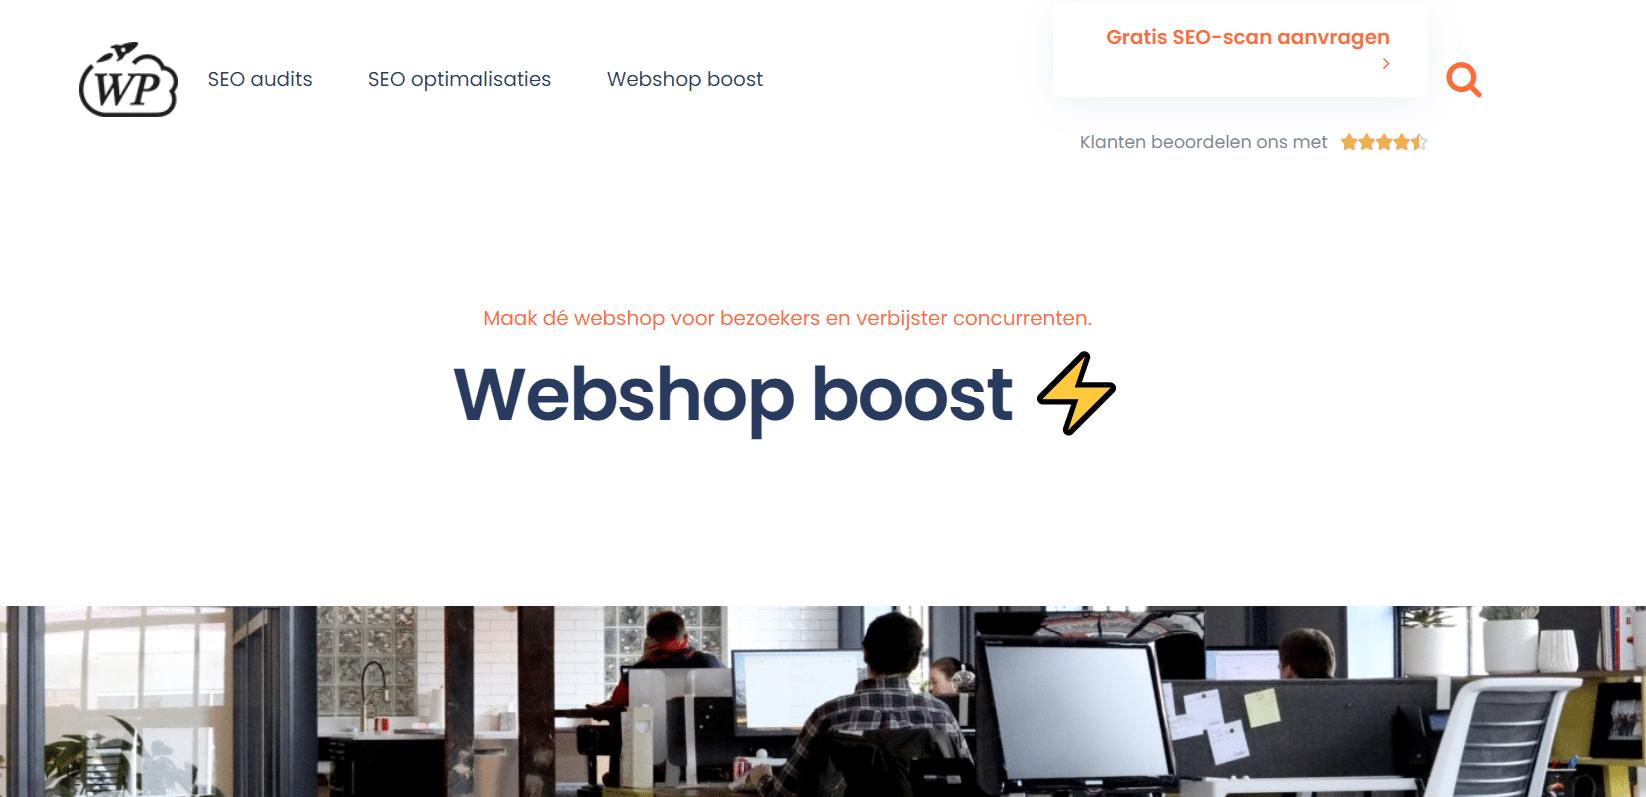 WPsnelheid WordPress snelheidsoptimalisatie